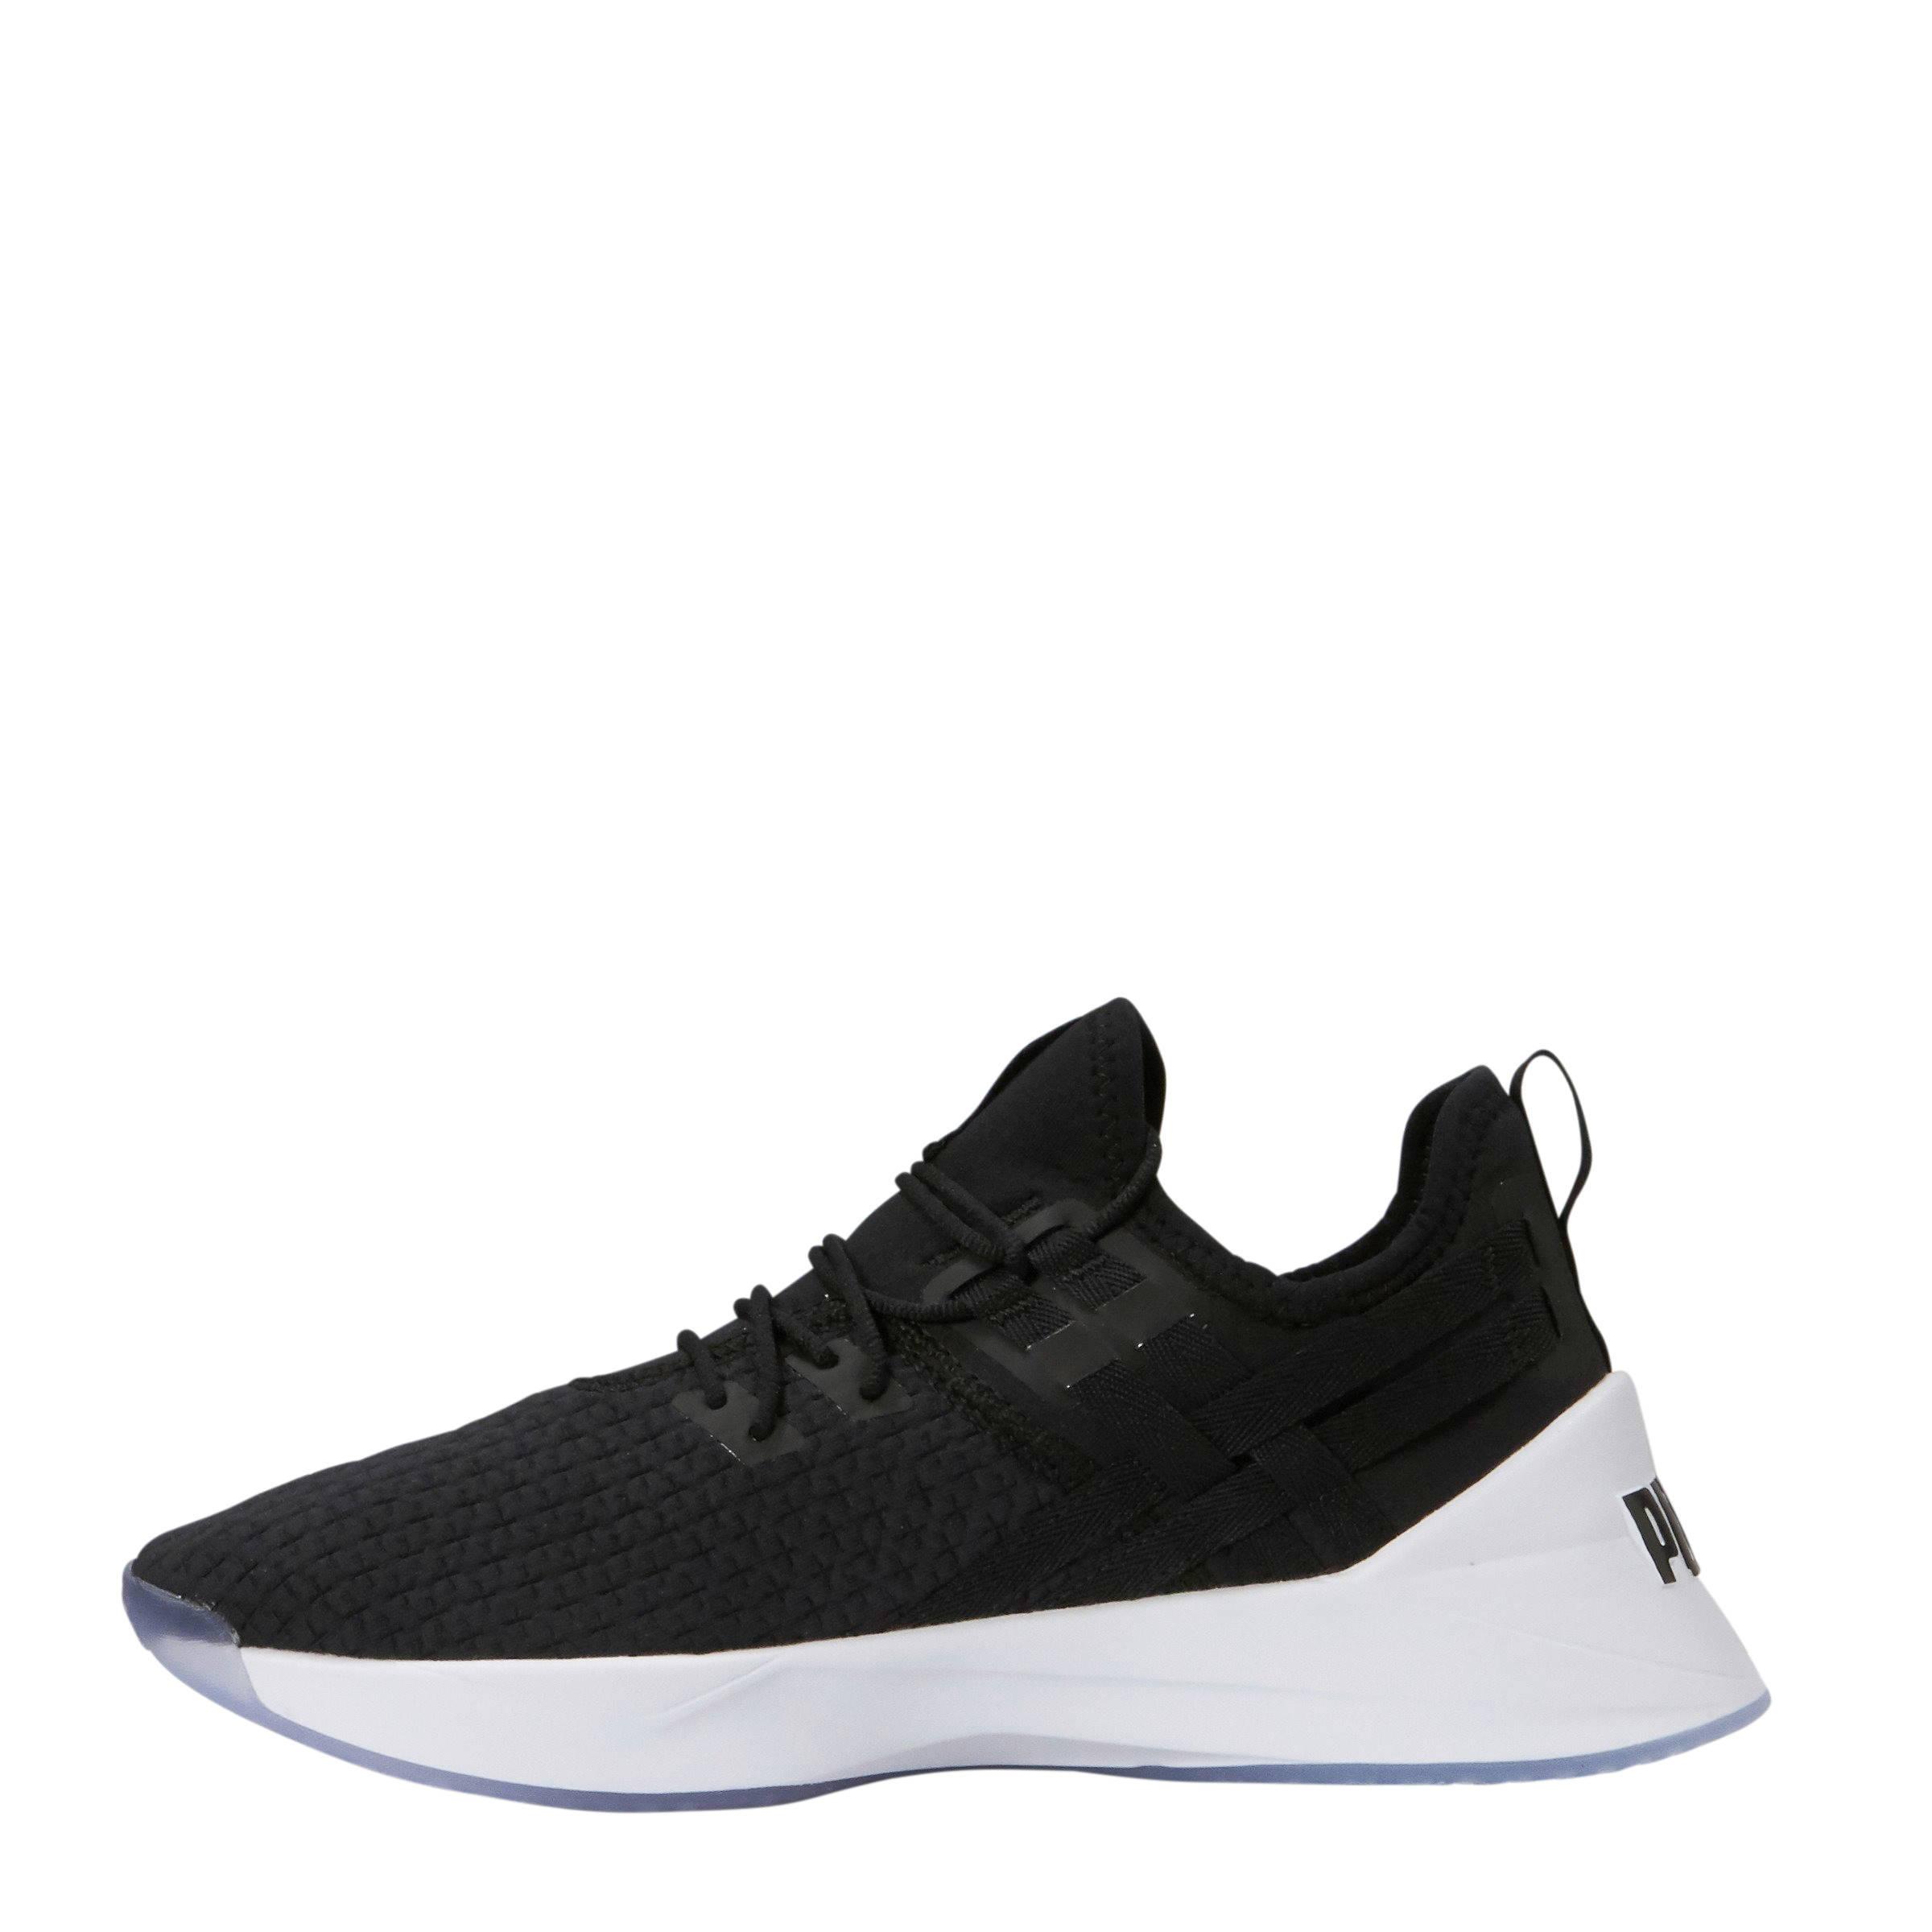 7a54418ffb4 Puma Jaab XT WN's fitness schoenen zwart/wit | wehkamp